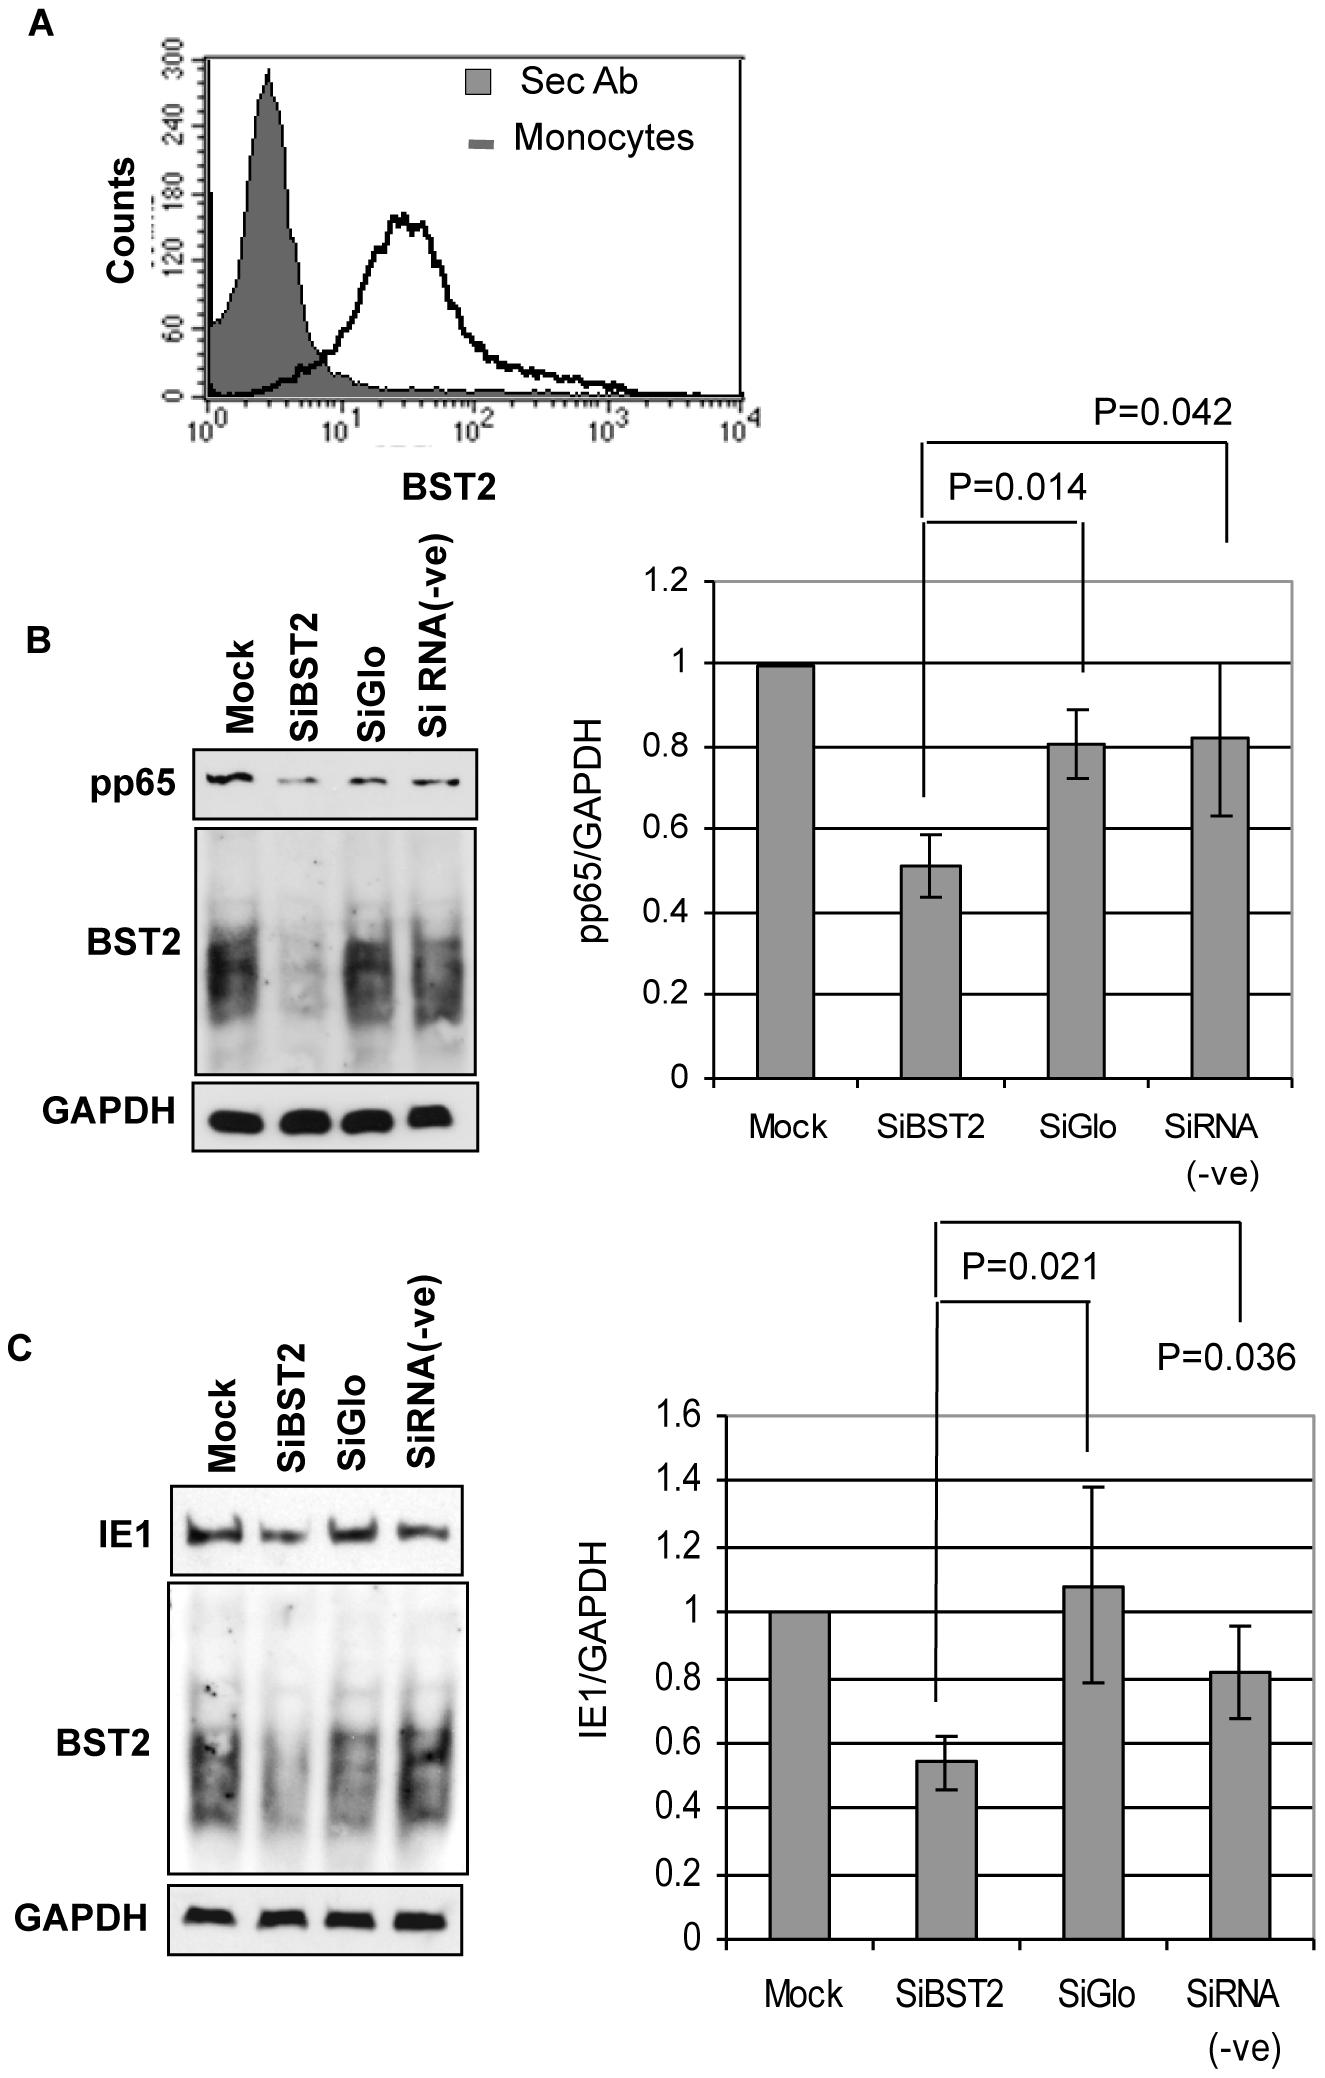 BST2 facilitates HCMV entry into primary human monocytes.